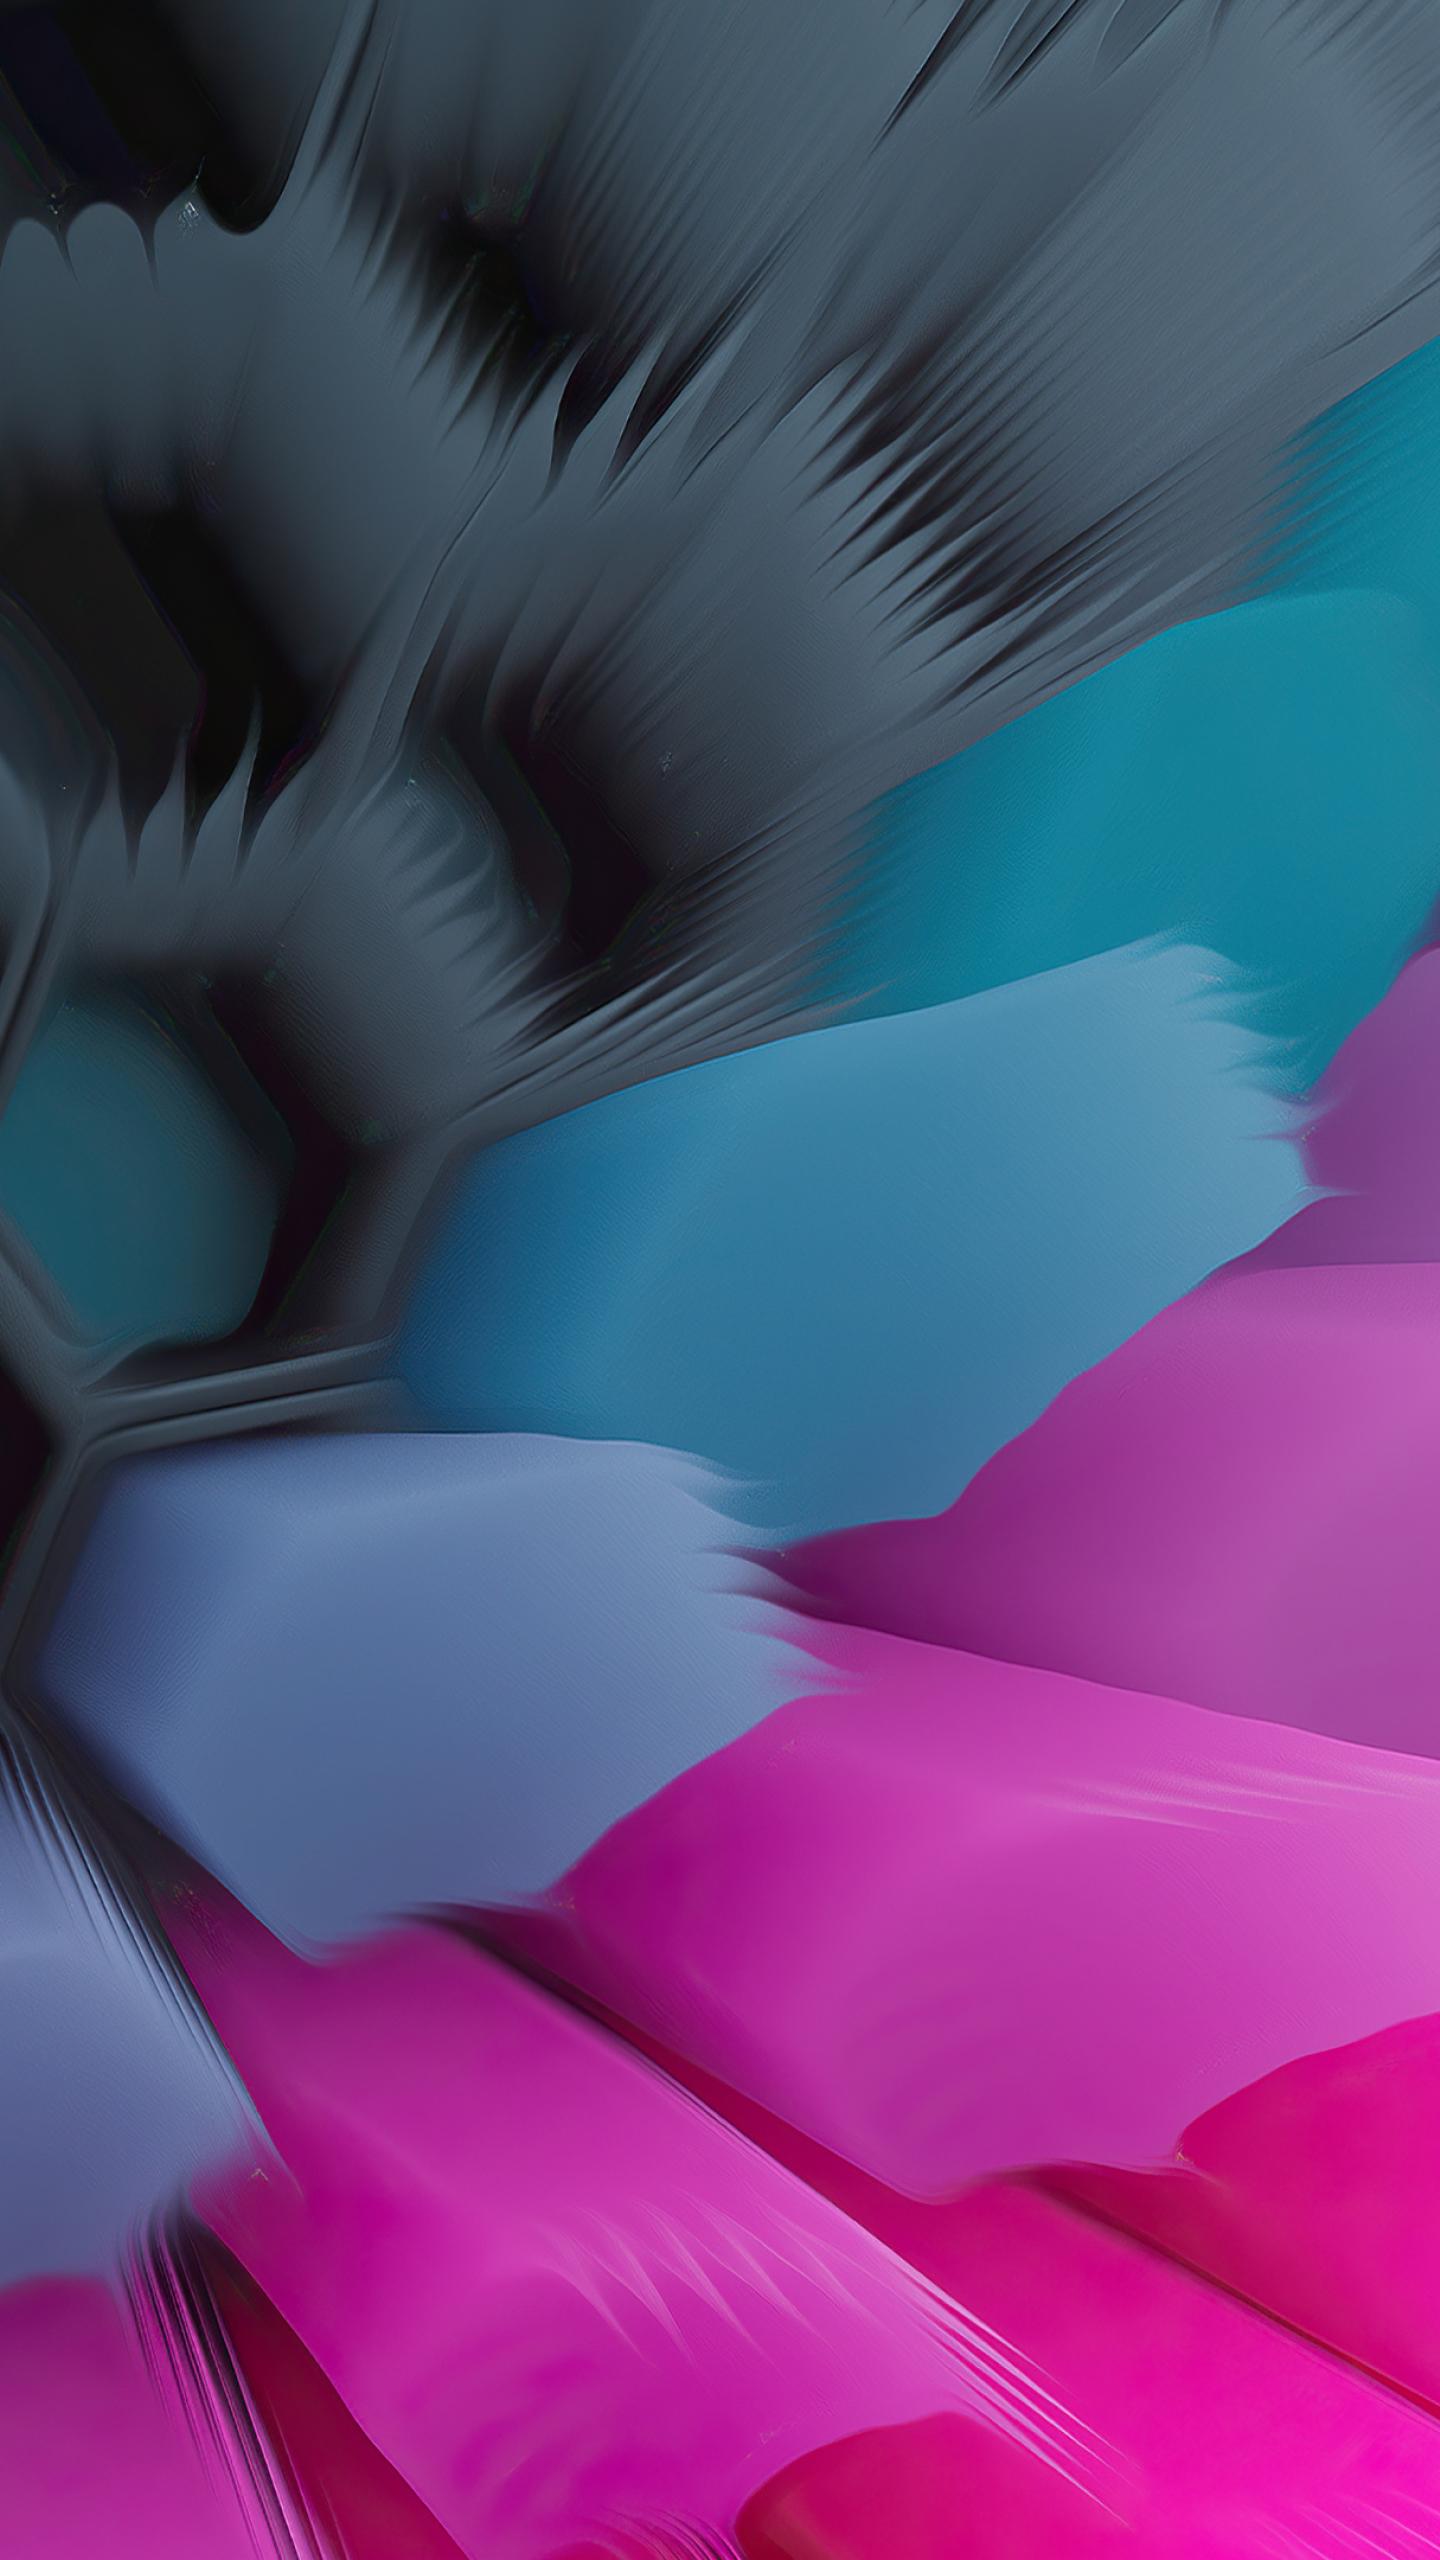 Pink Blue 4K Hexagon Wallpaper in 1440x2560 Resolution